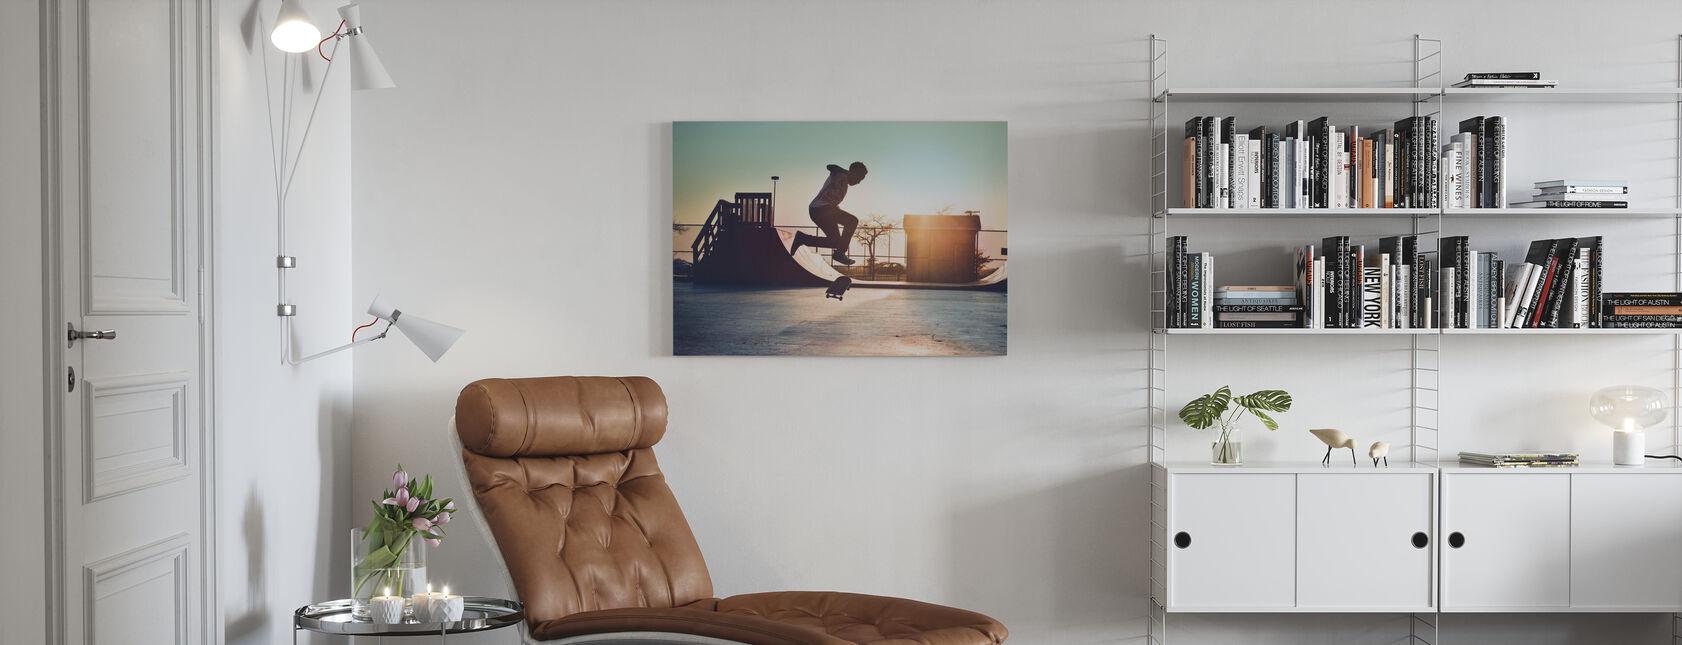 Kickflip - Canvas print - Living Room